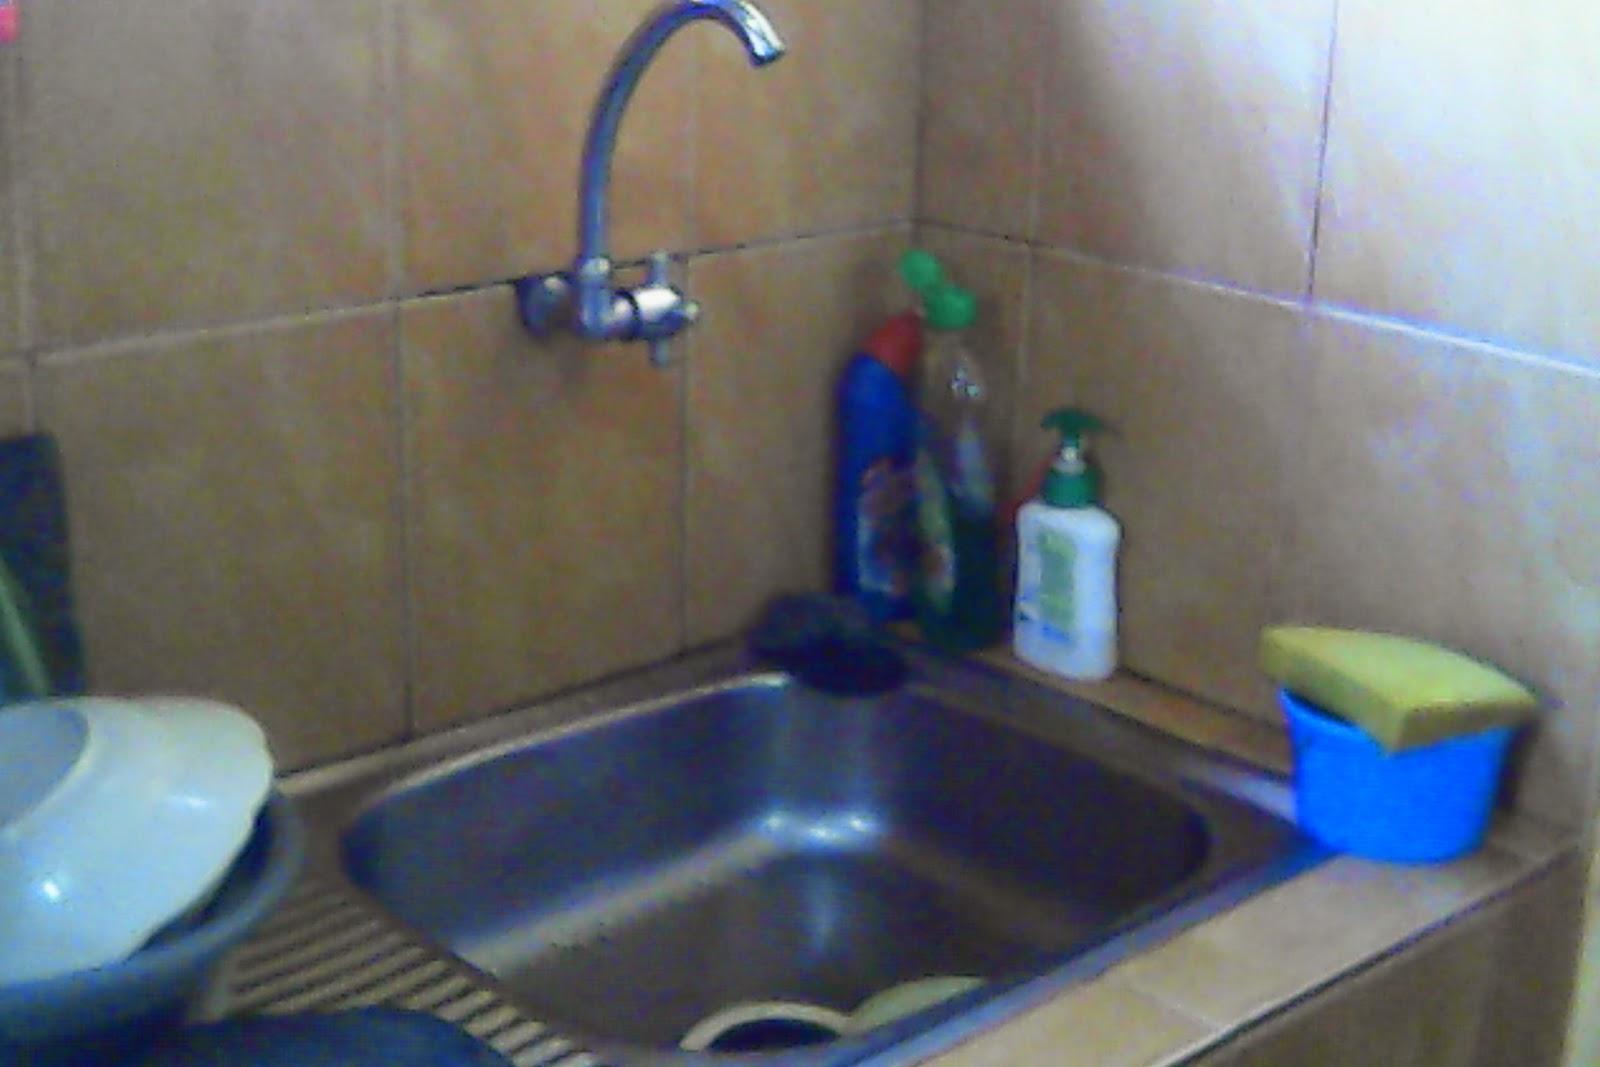 Empat Langkah Cara Mudah Membersihkan Dapur